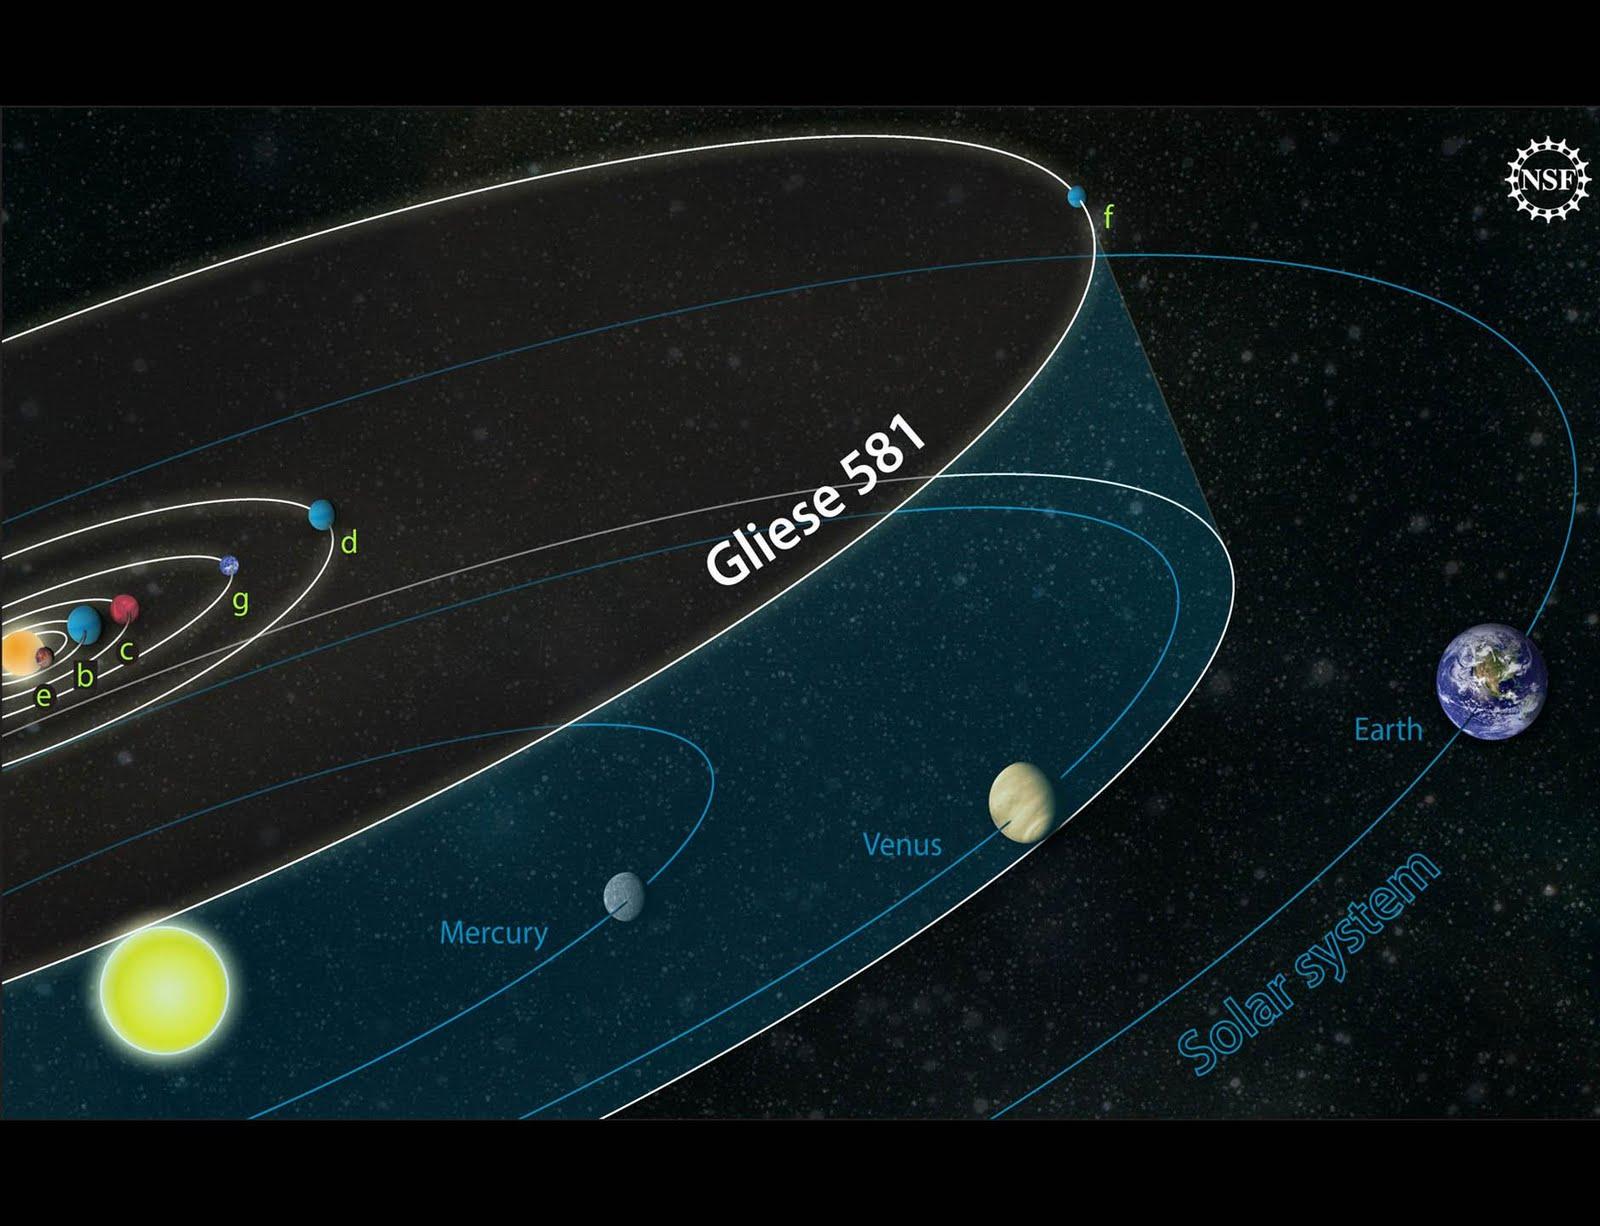 http://3.bp.blogspot.com/_bstXBEDnG9w/TKYdQ-m3tEI/AAAAAAAADnU/eXlqioqWyfo/s1600/gliese+581+solar+systeme+picture+1.jpeg